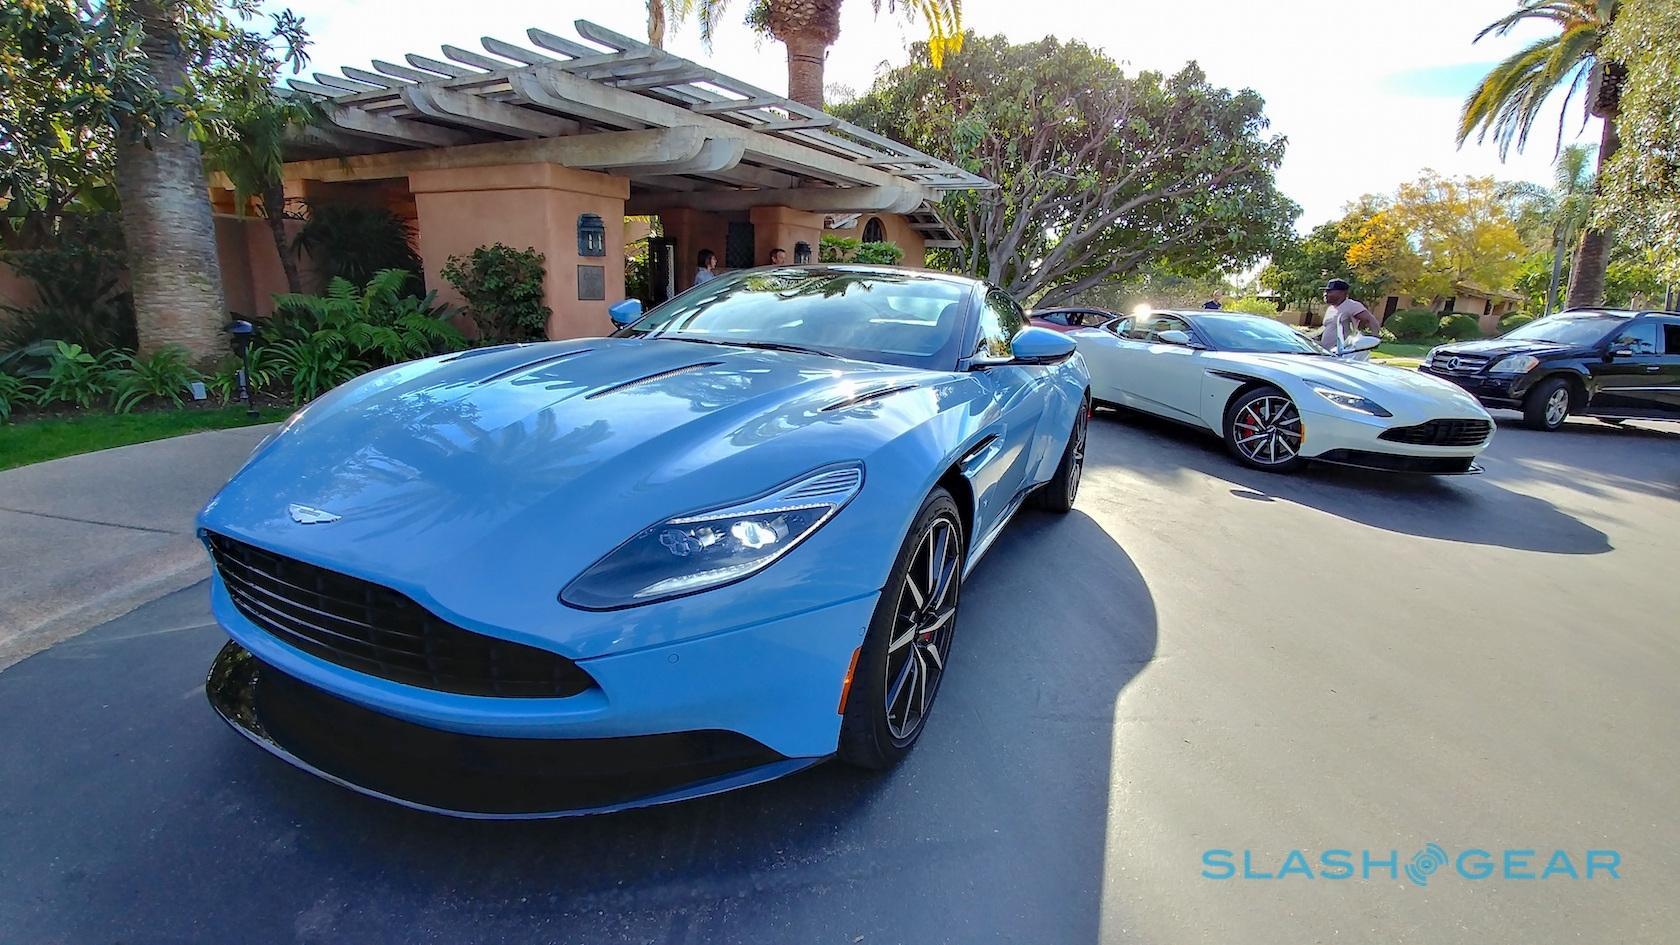 The 2017 Aston Martin Db11 Is Unlike Any Other Gran Tourismo Slashgear